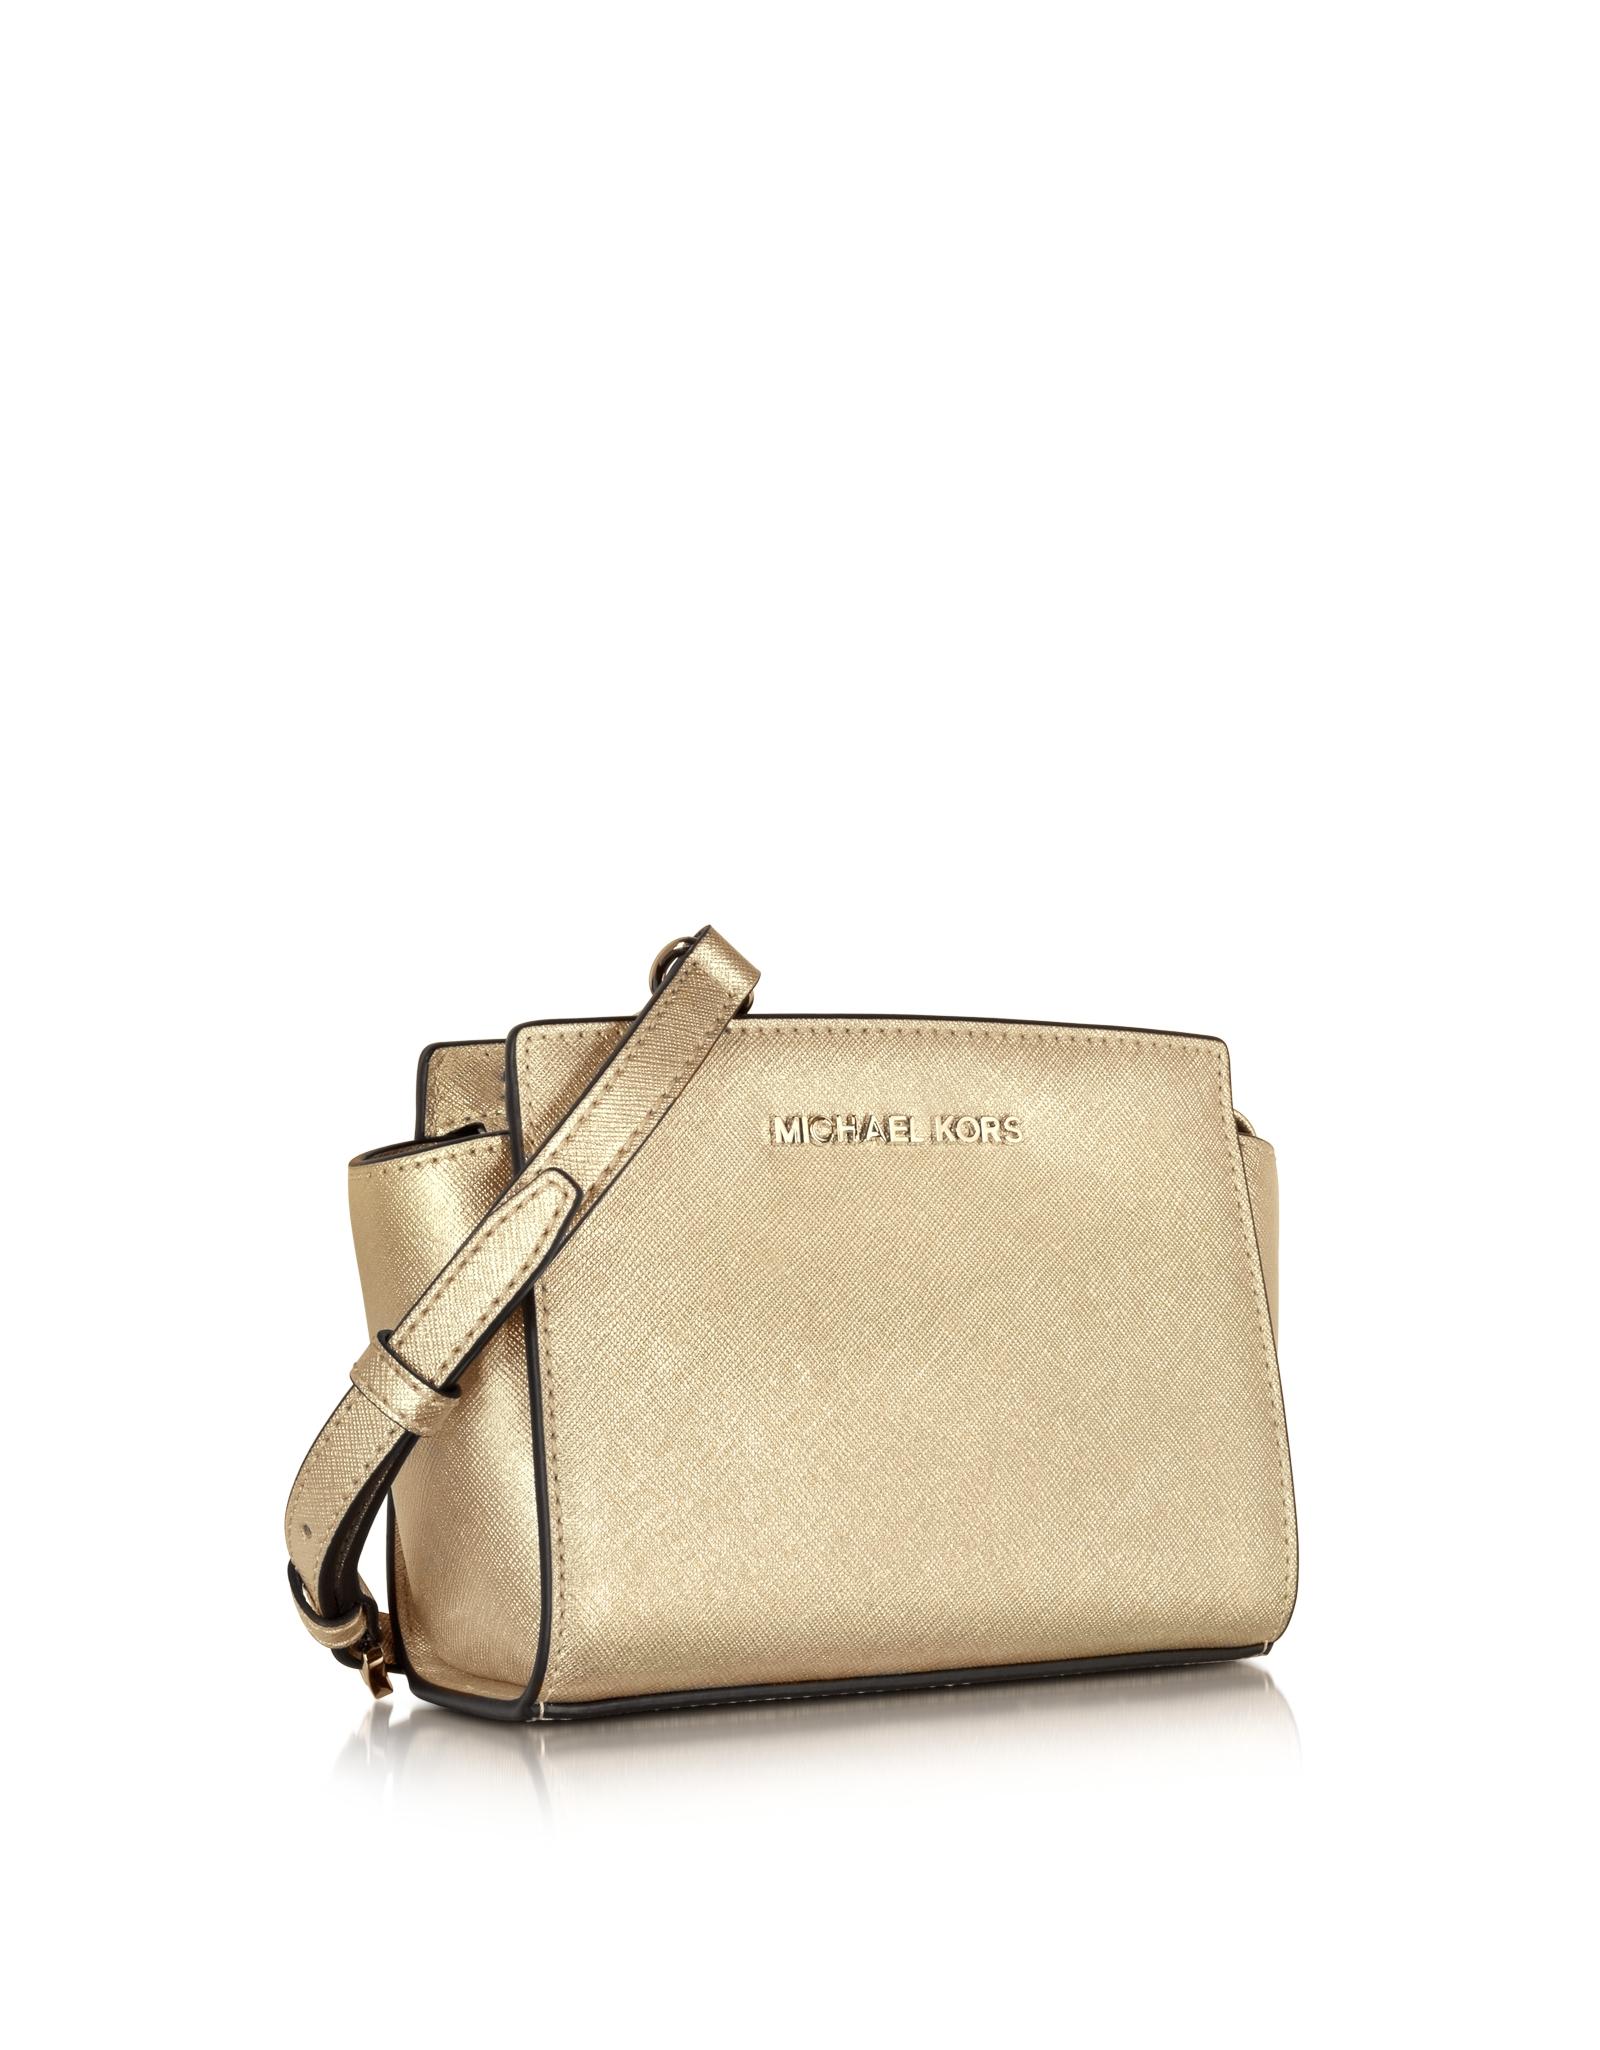 fc2e96bc5aa64 Lyst - Michael Kors Pale Gold Metallic Saffiano Leather Selma Mini Messenger  Bag in Metallic